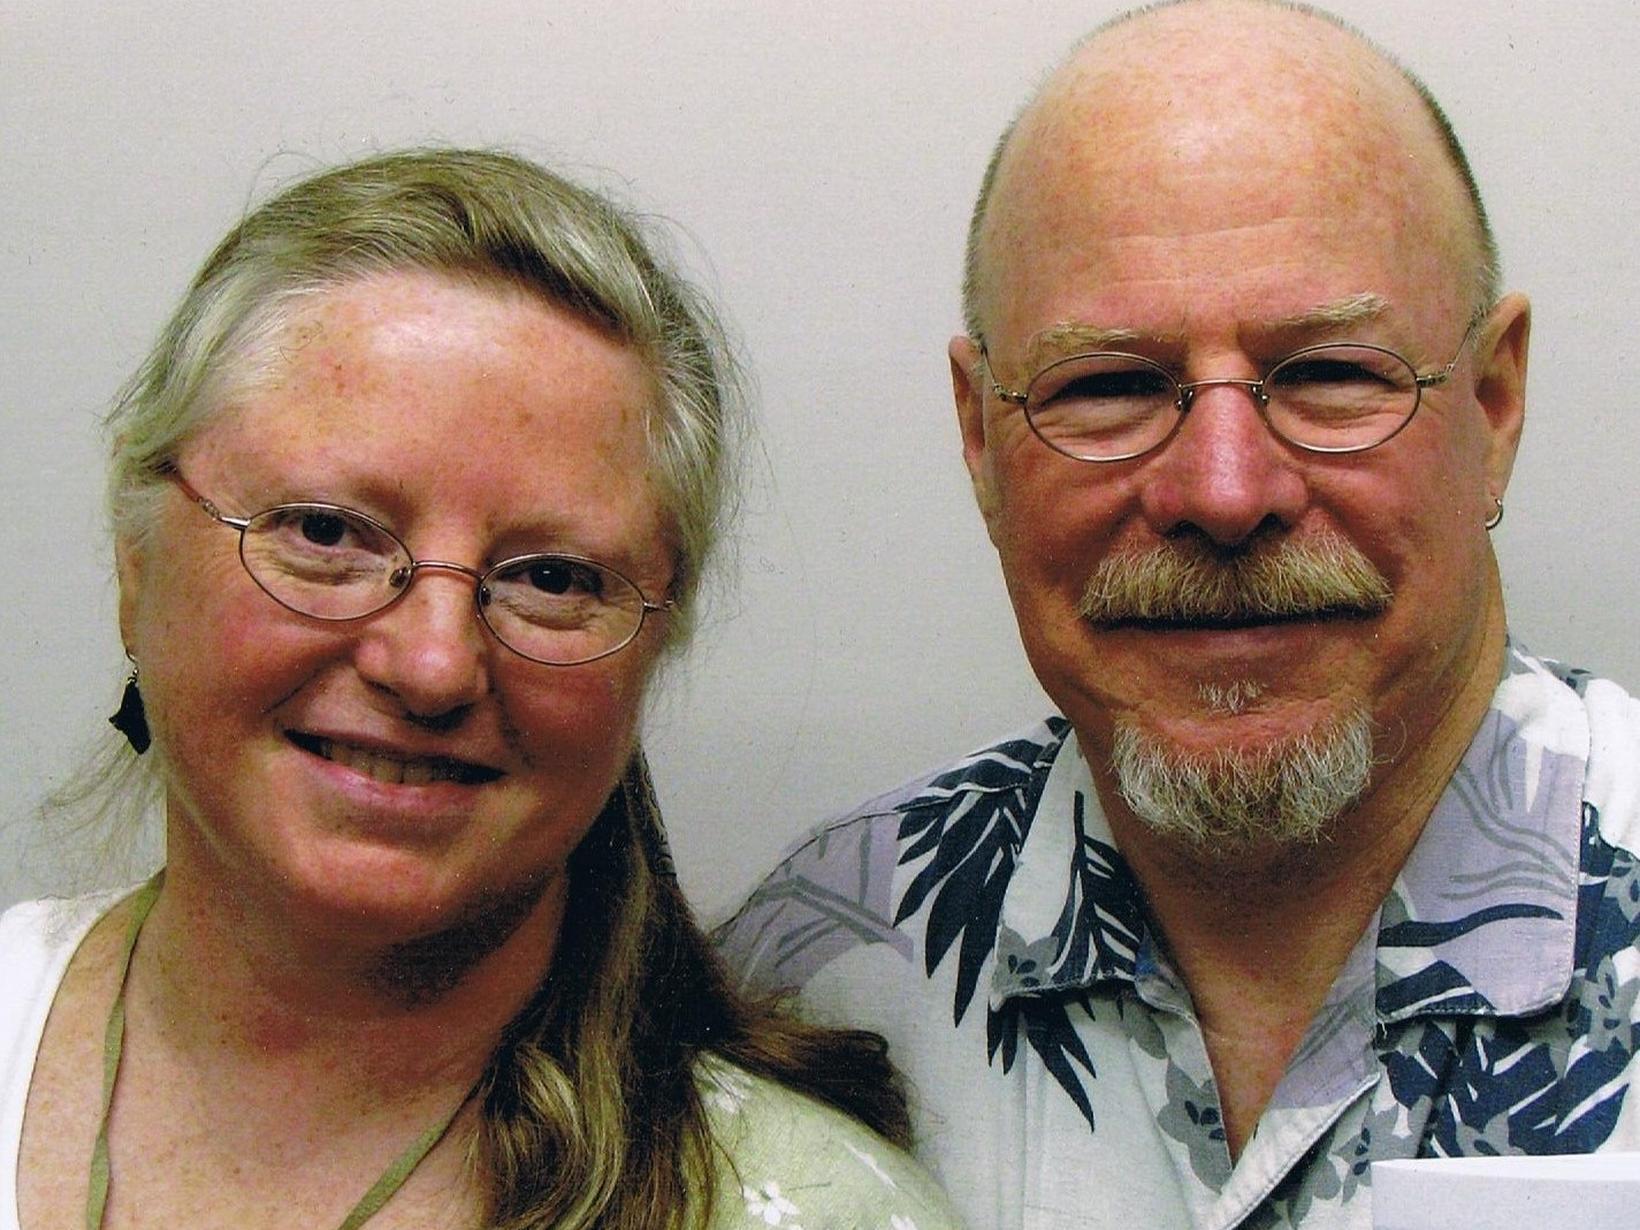 Craig & Rosemary from Qualicum Beach, British Columbia, Canada